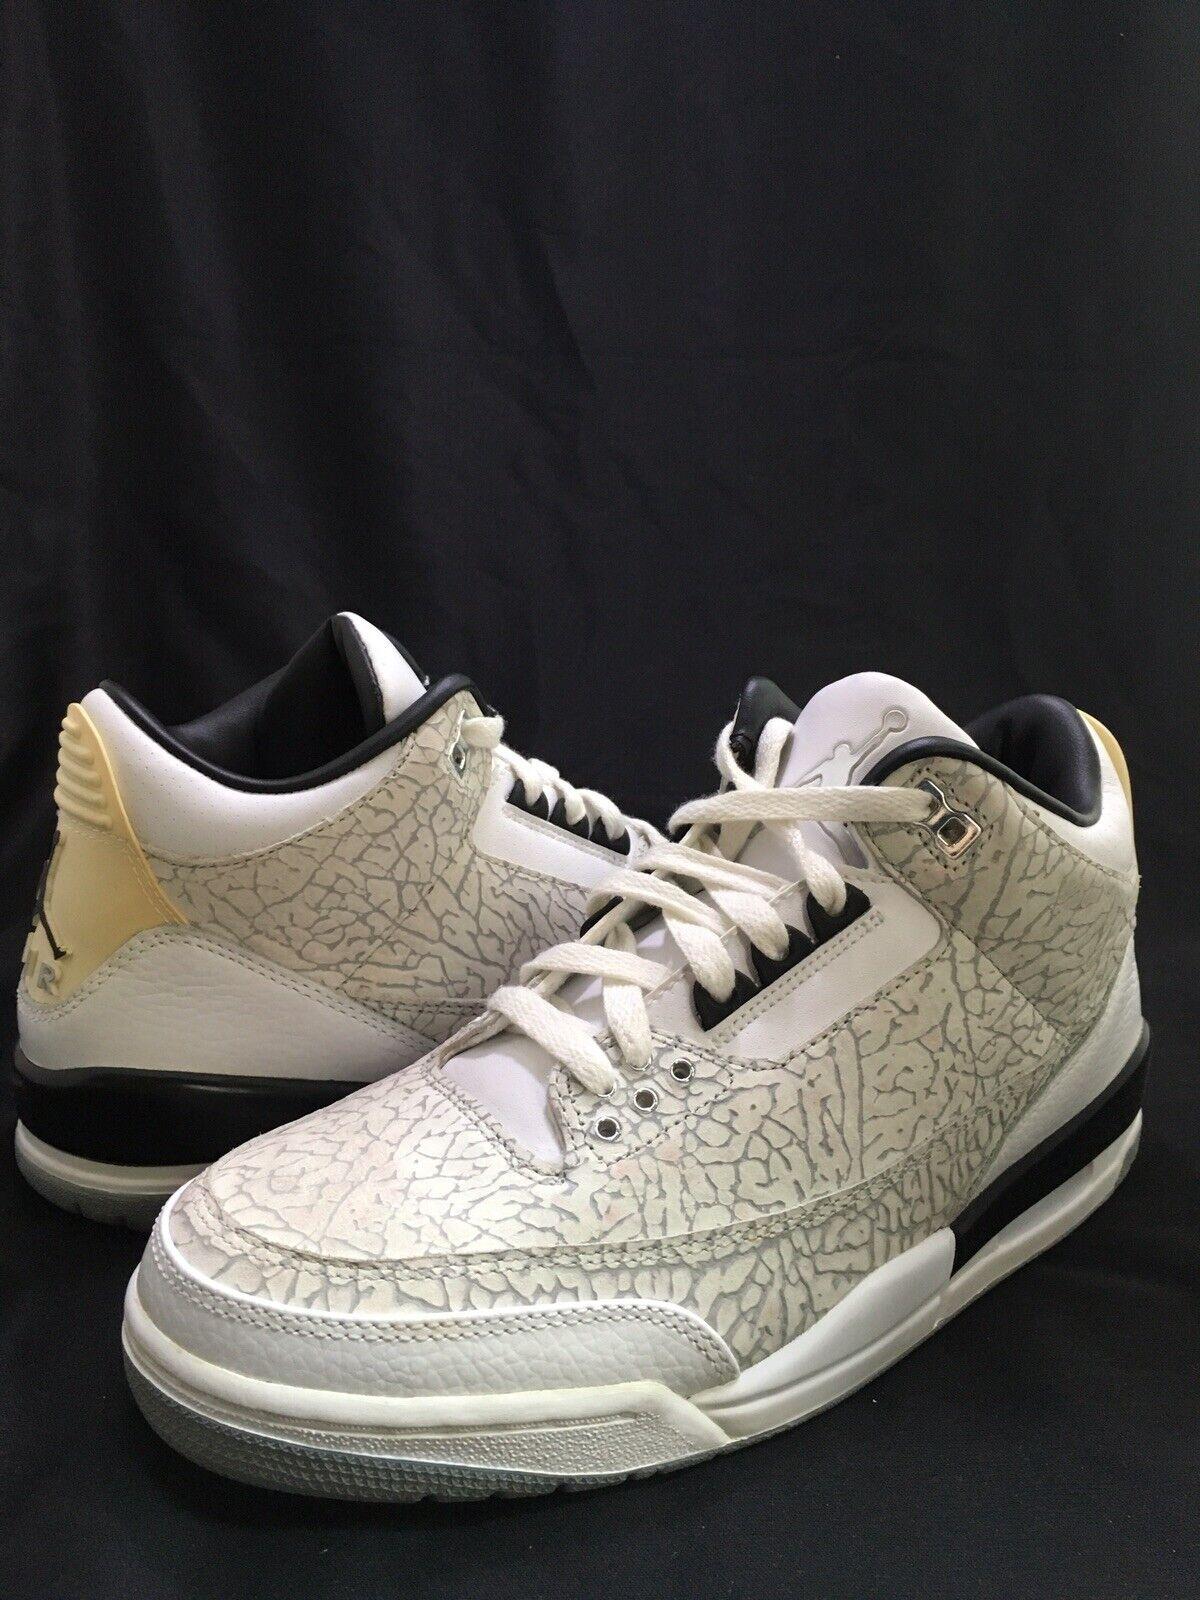 Jordan Retro 3 bianca Flip Dimensione 8